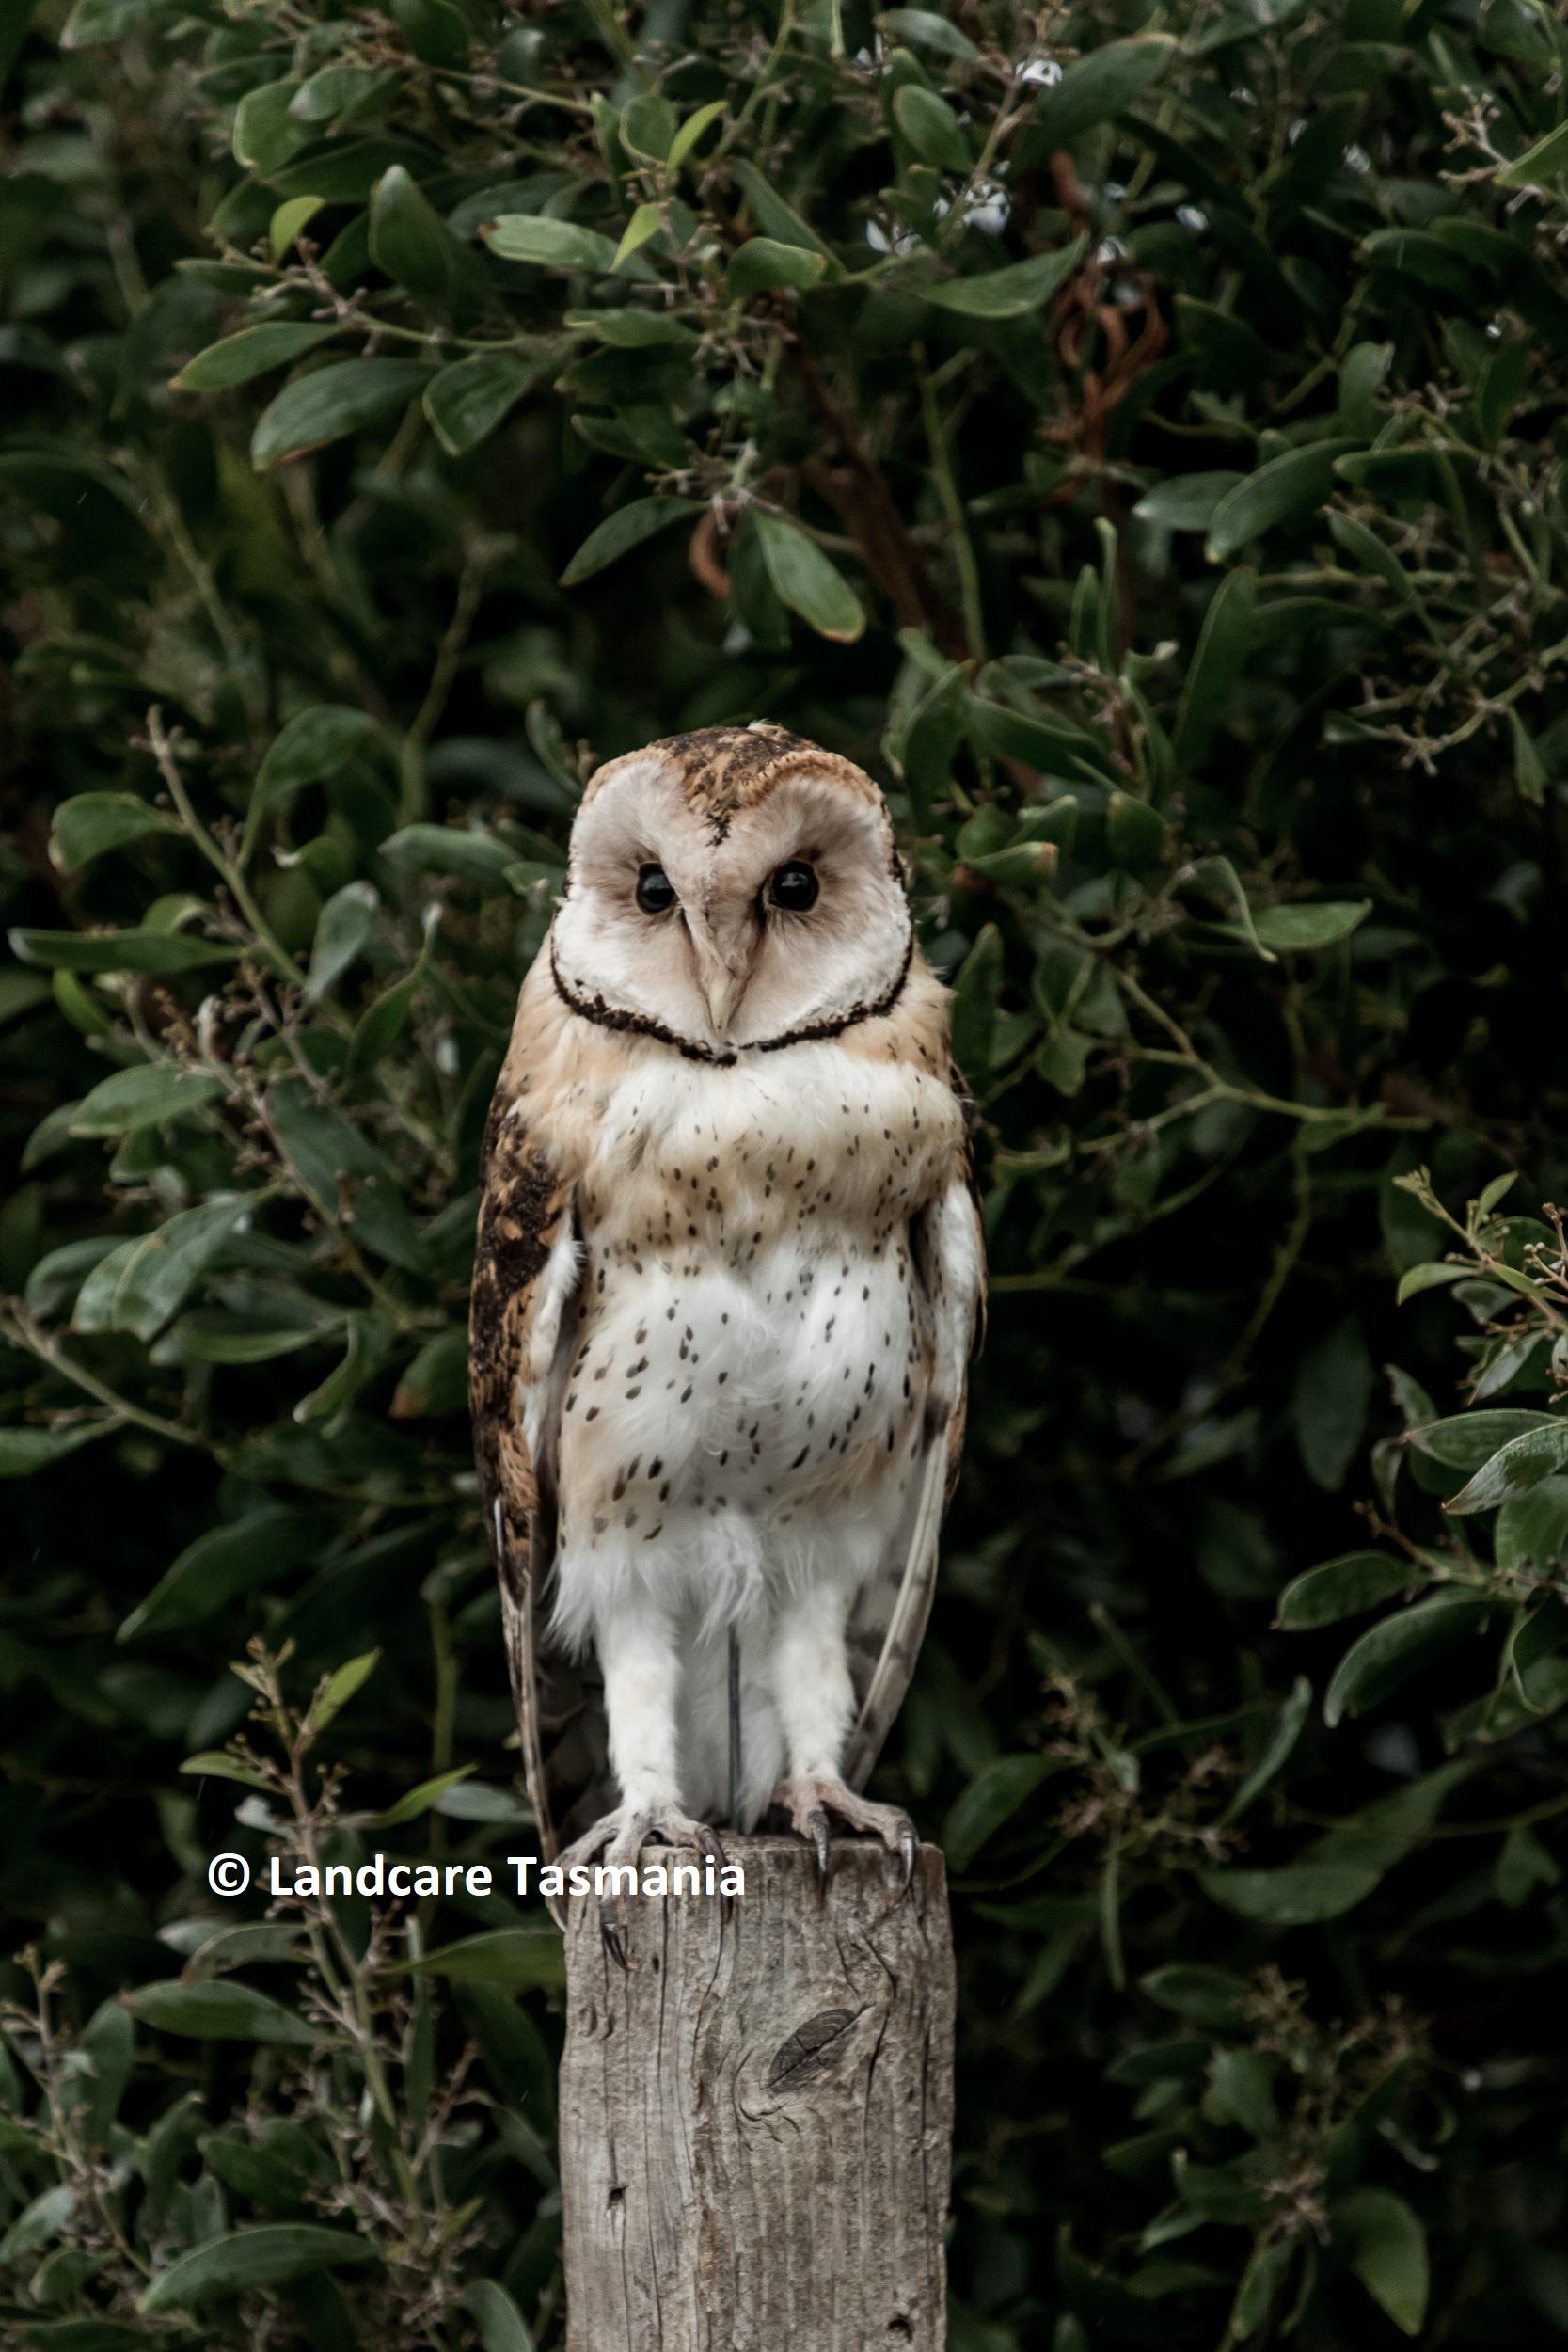 Ameila_the_owl_LandcareTasRodenticidesProg_©NatashaMulhall_web2.jpg